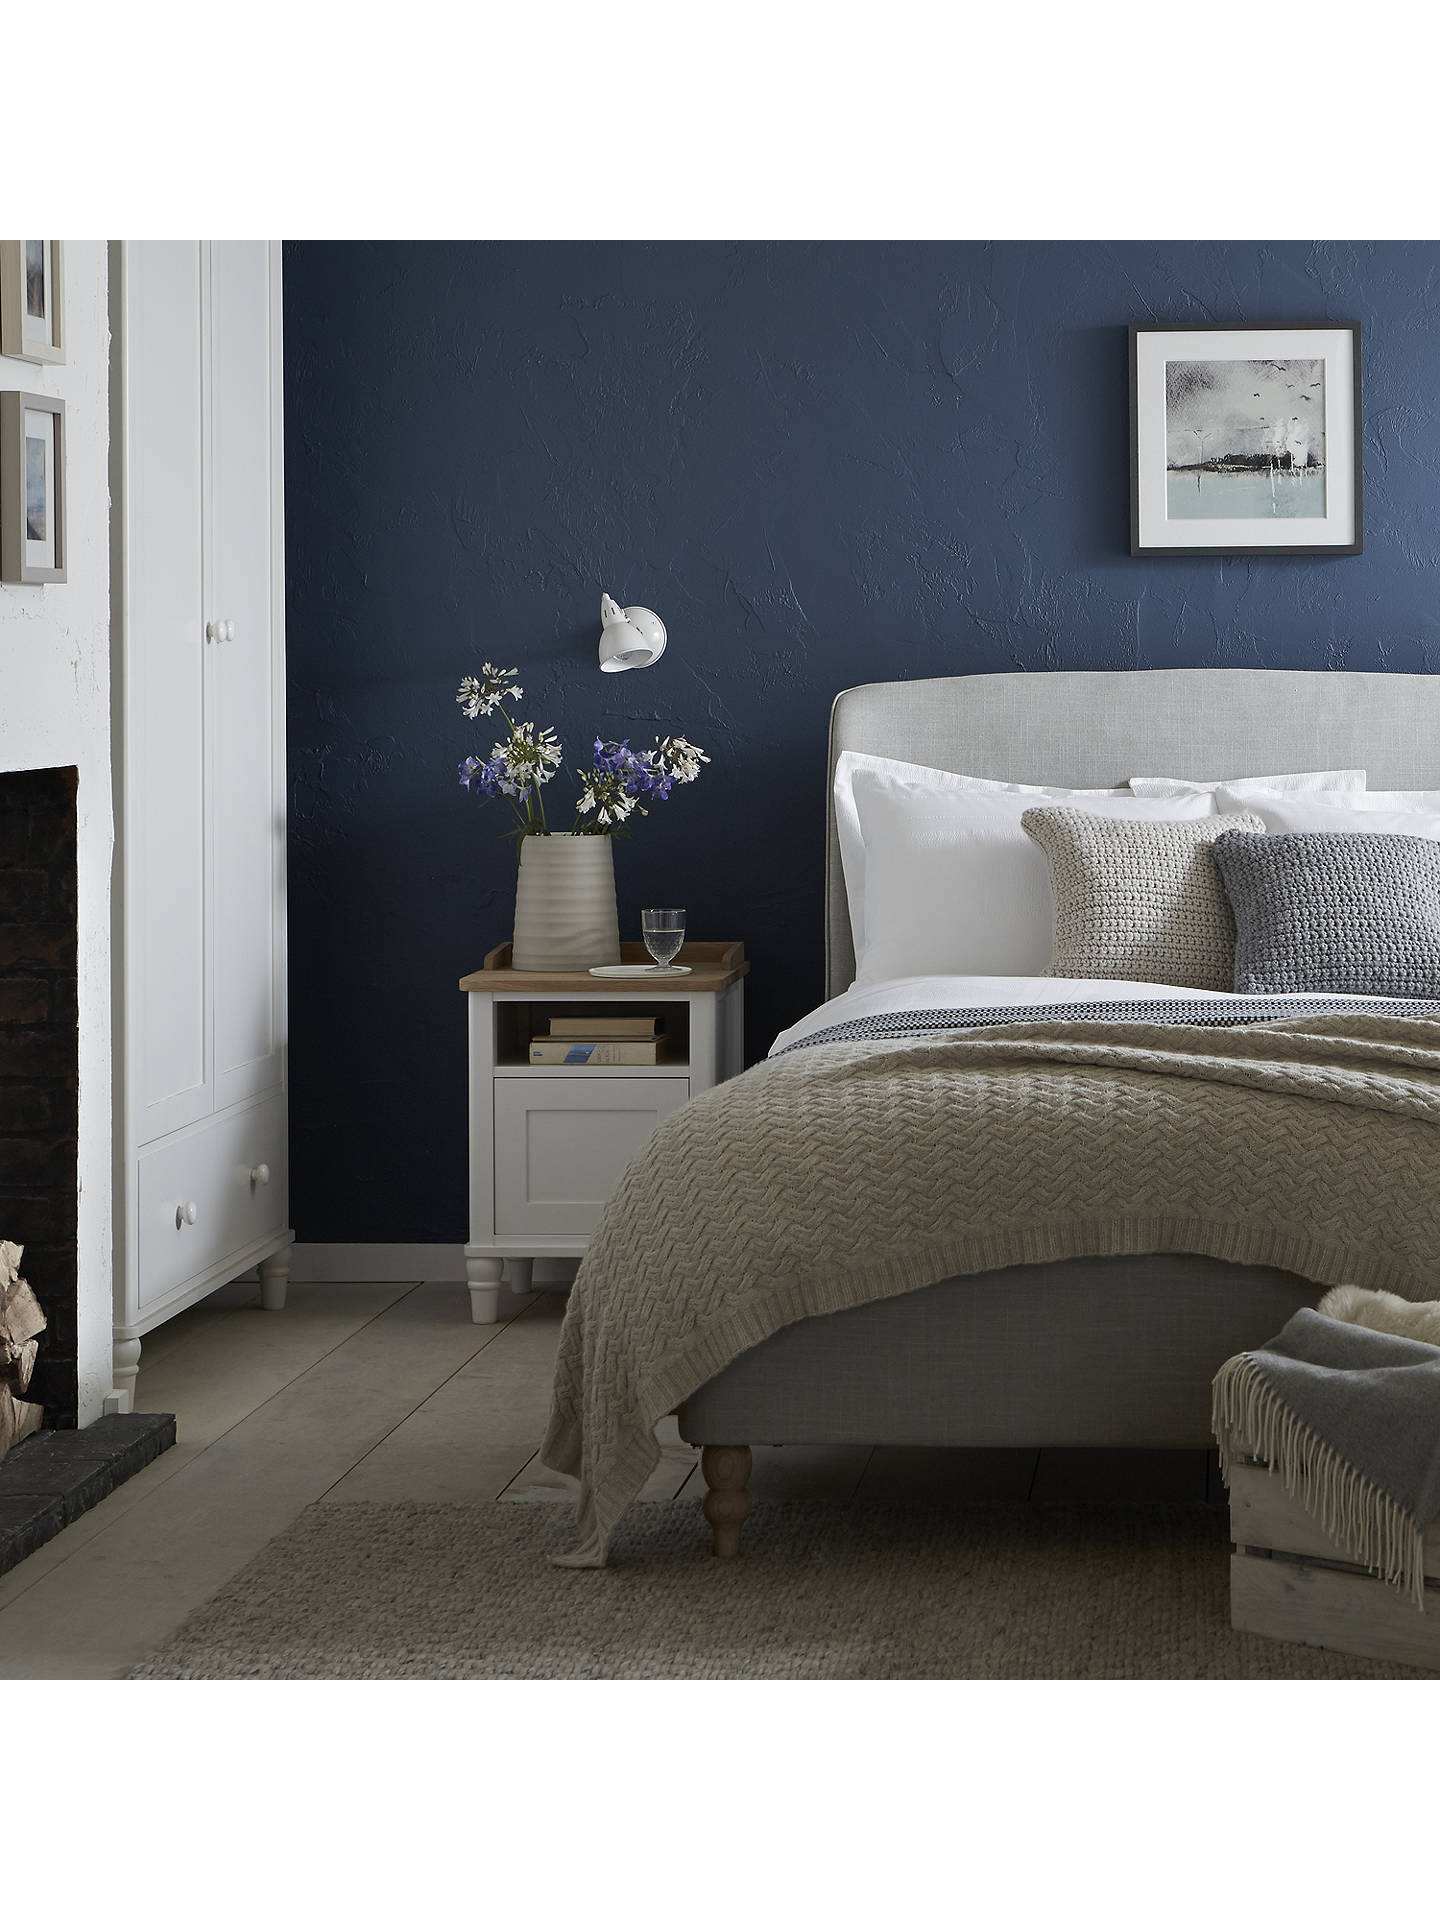 4b4607708b42 Buy Croft Collection Skye Bed Frame, Super King Size, Grey Online at  johnlewis.